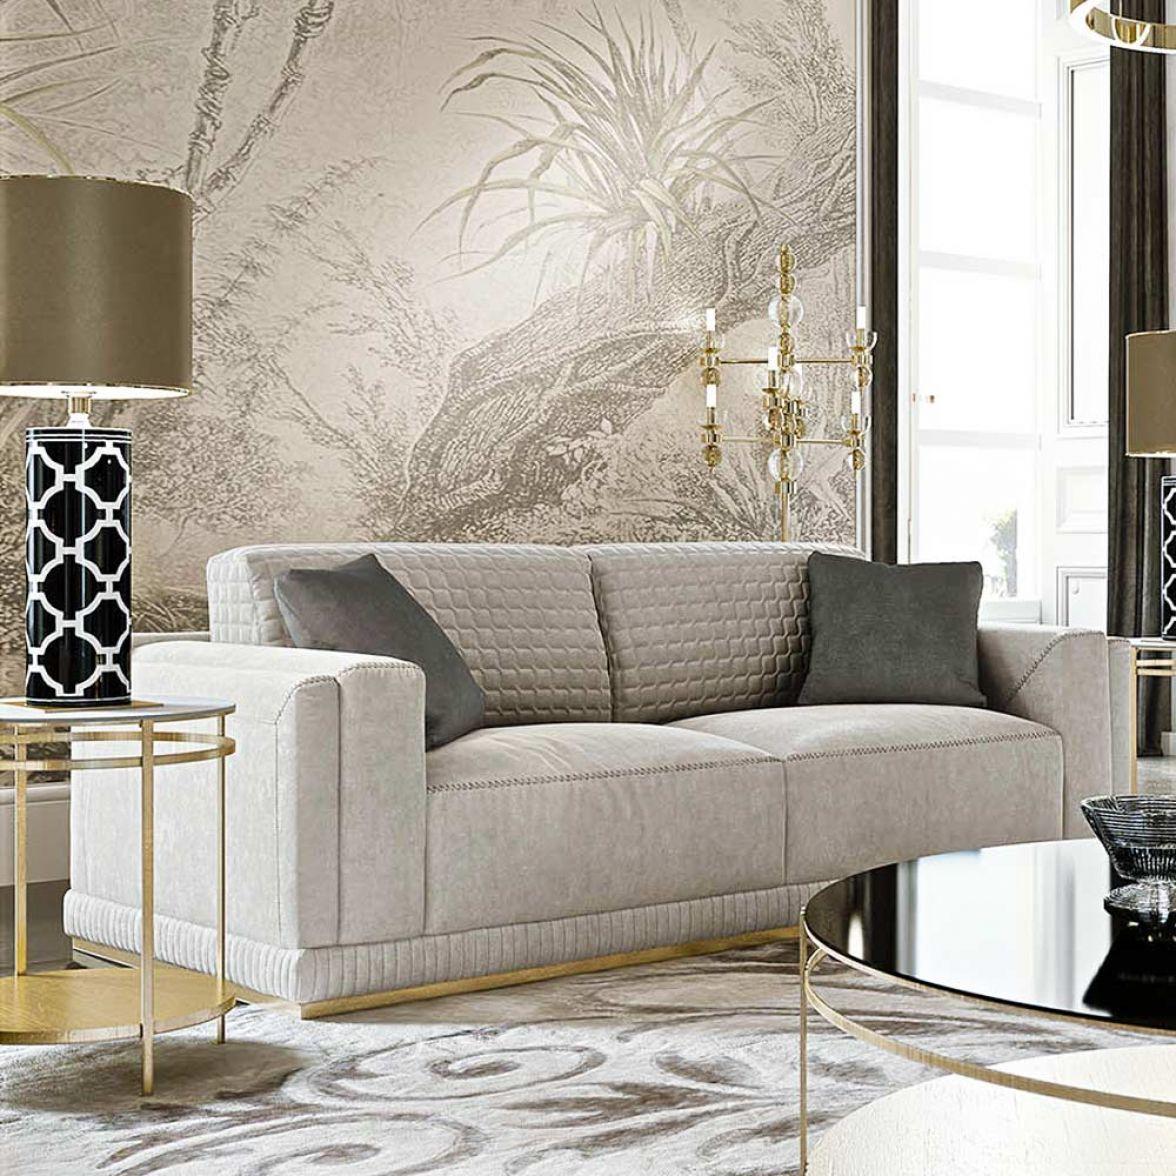 Raffaello sofa фото цена